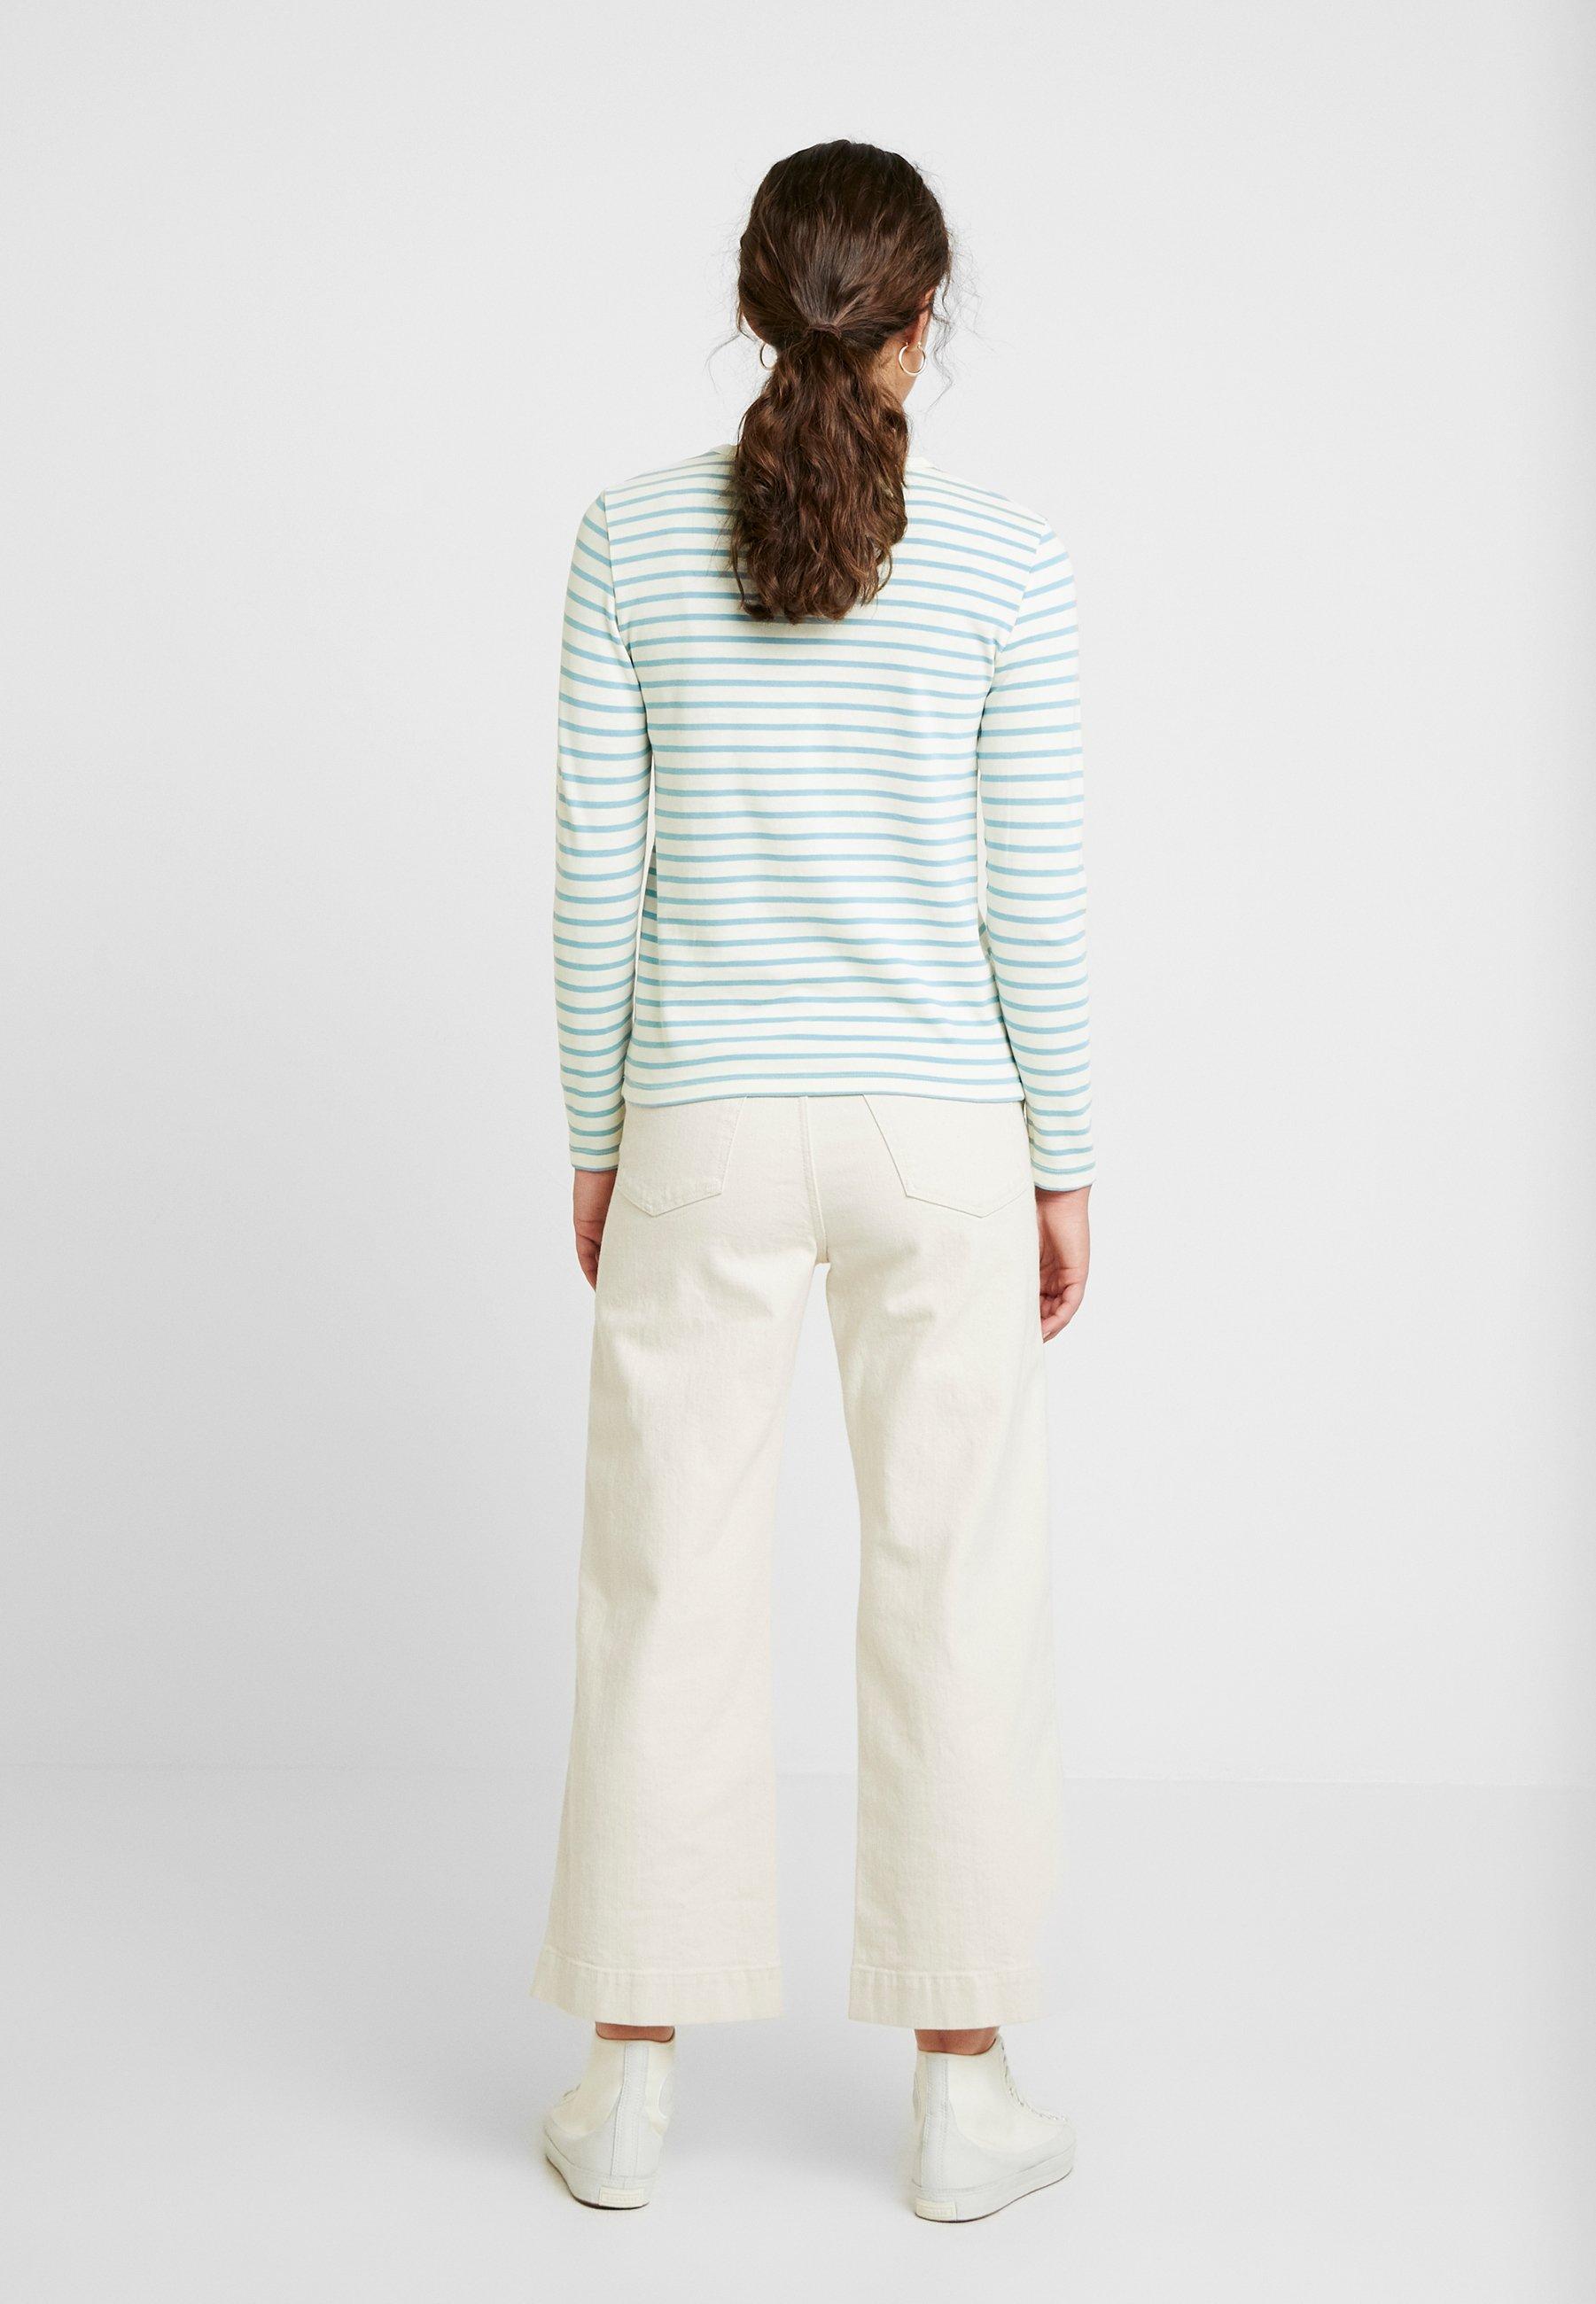 Wood Long SleeveT shirt À Longues Manches Off white blue Moa 8OPn0kw